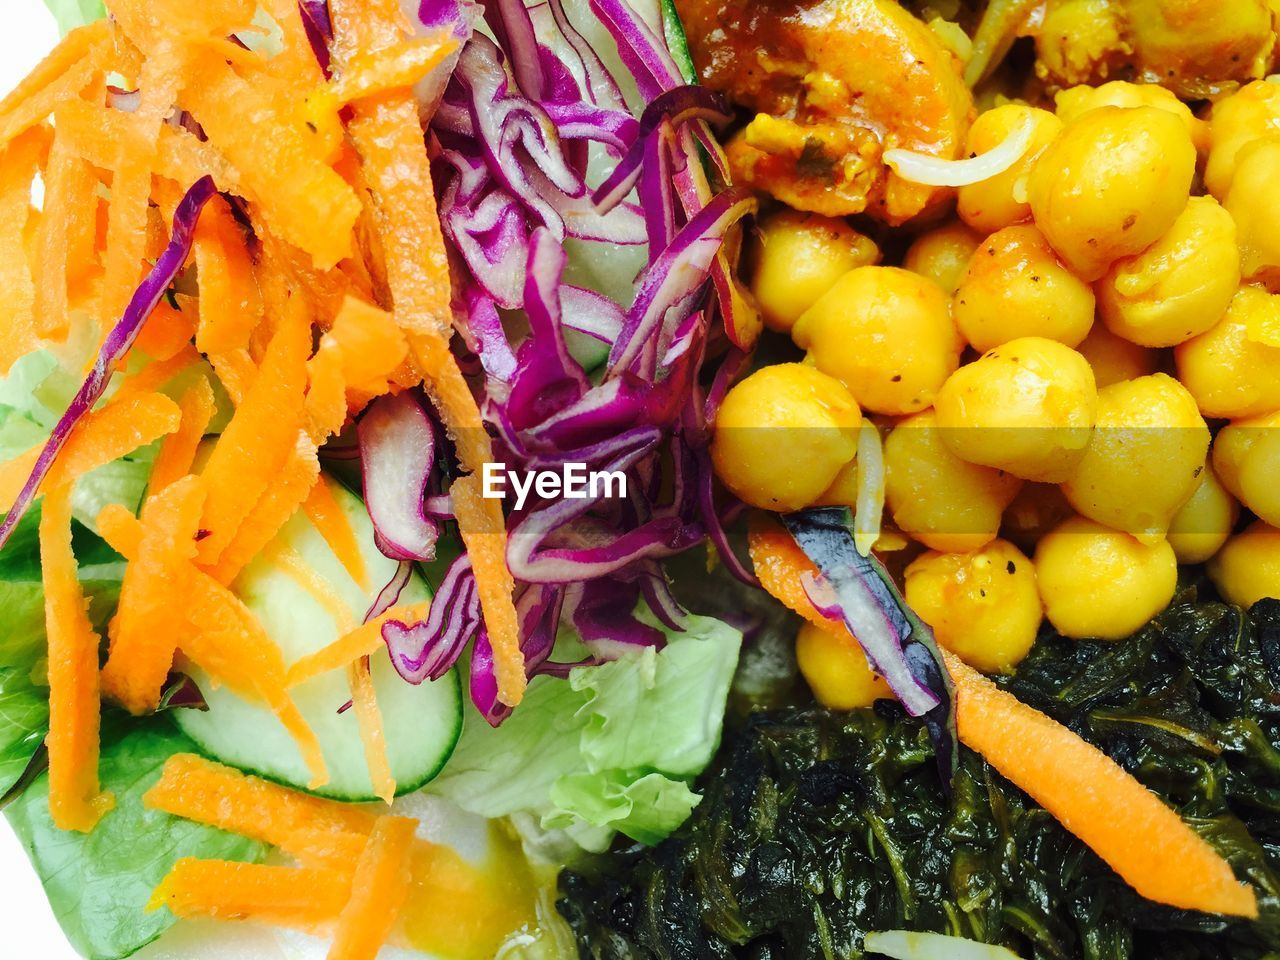 Detail shot of salad